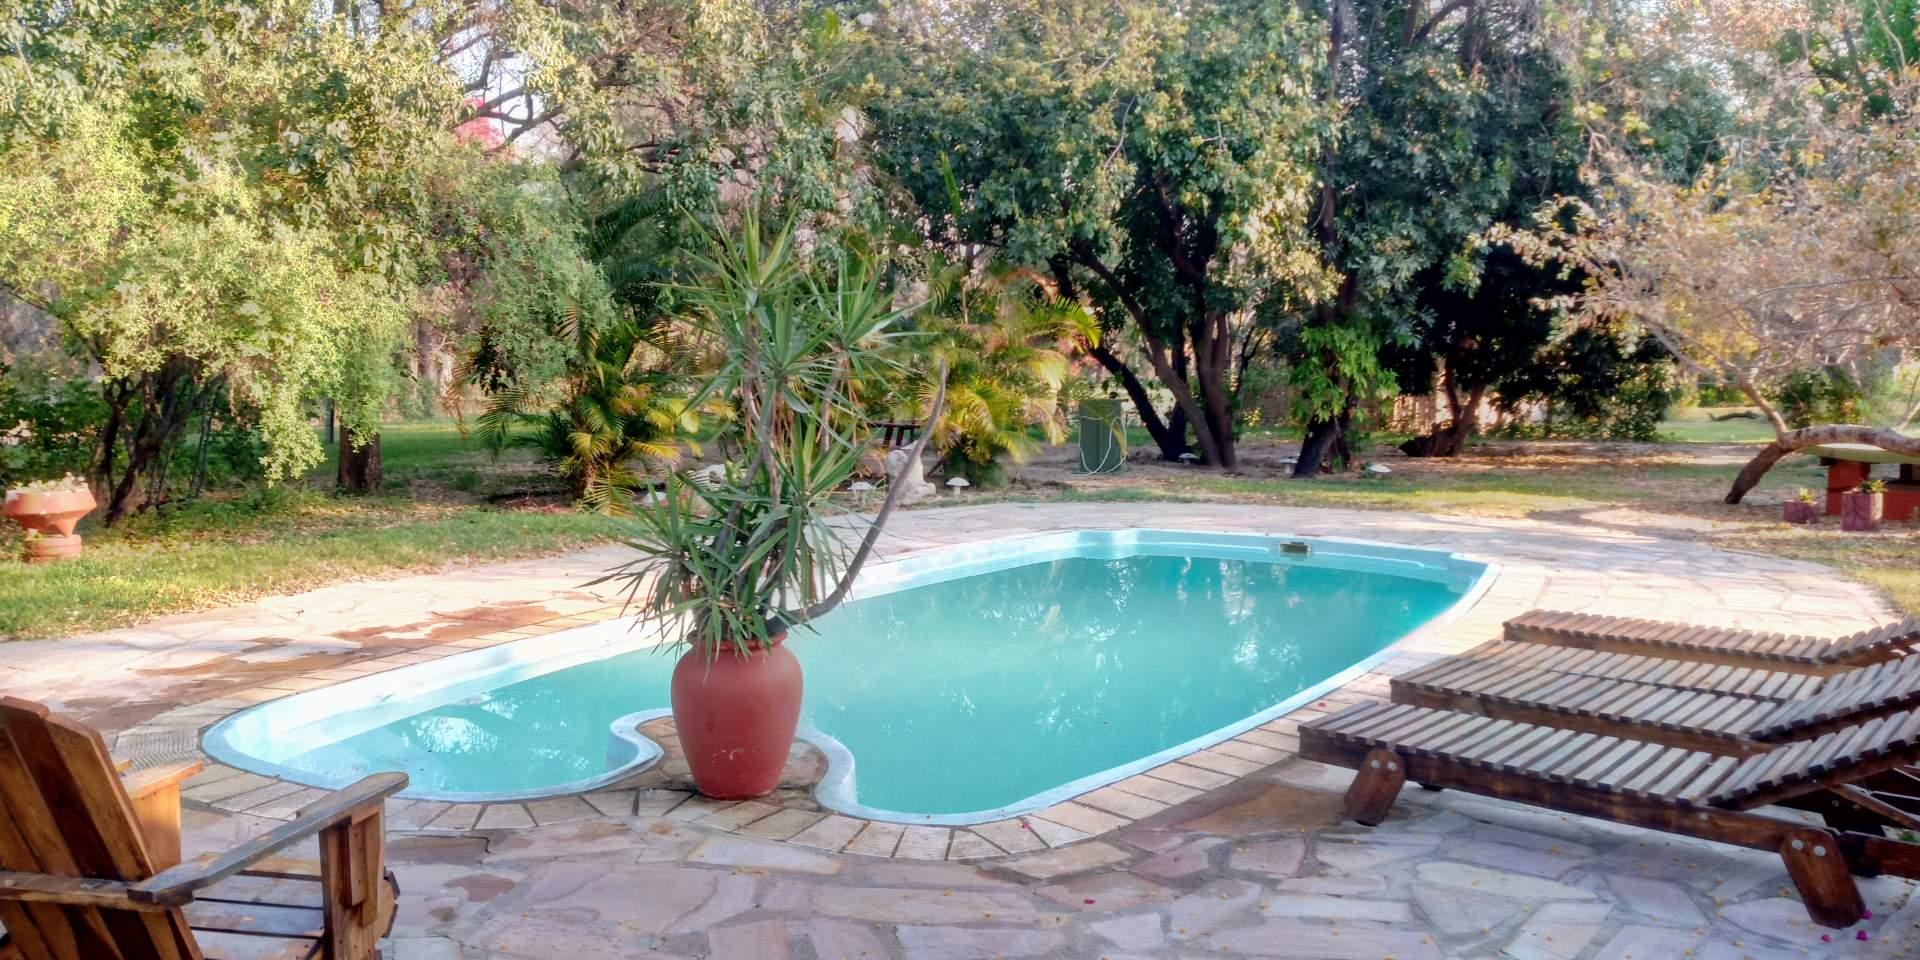 A swimming pool to help you relax as you braai